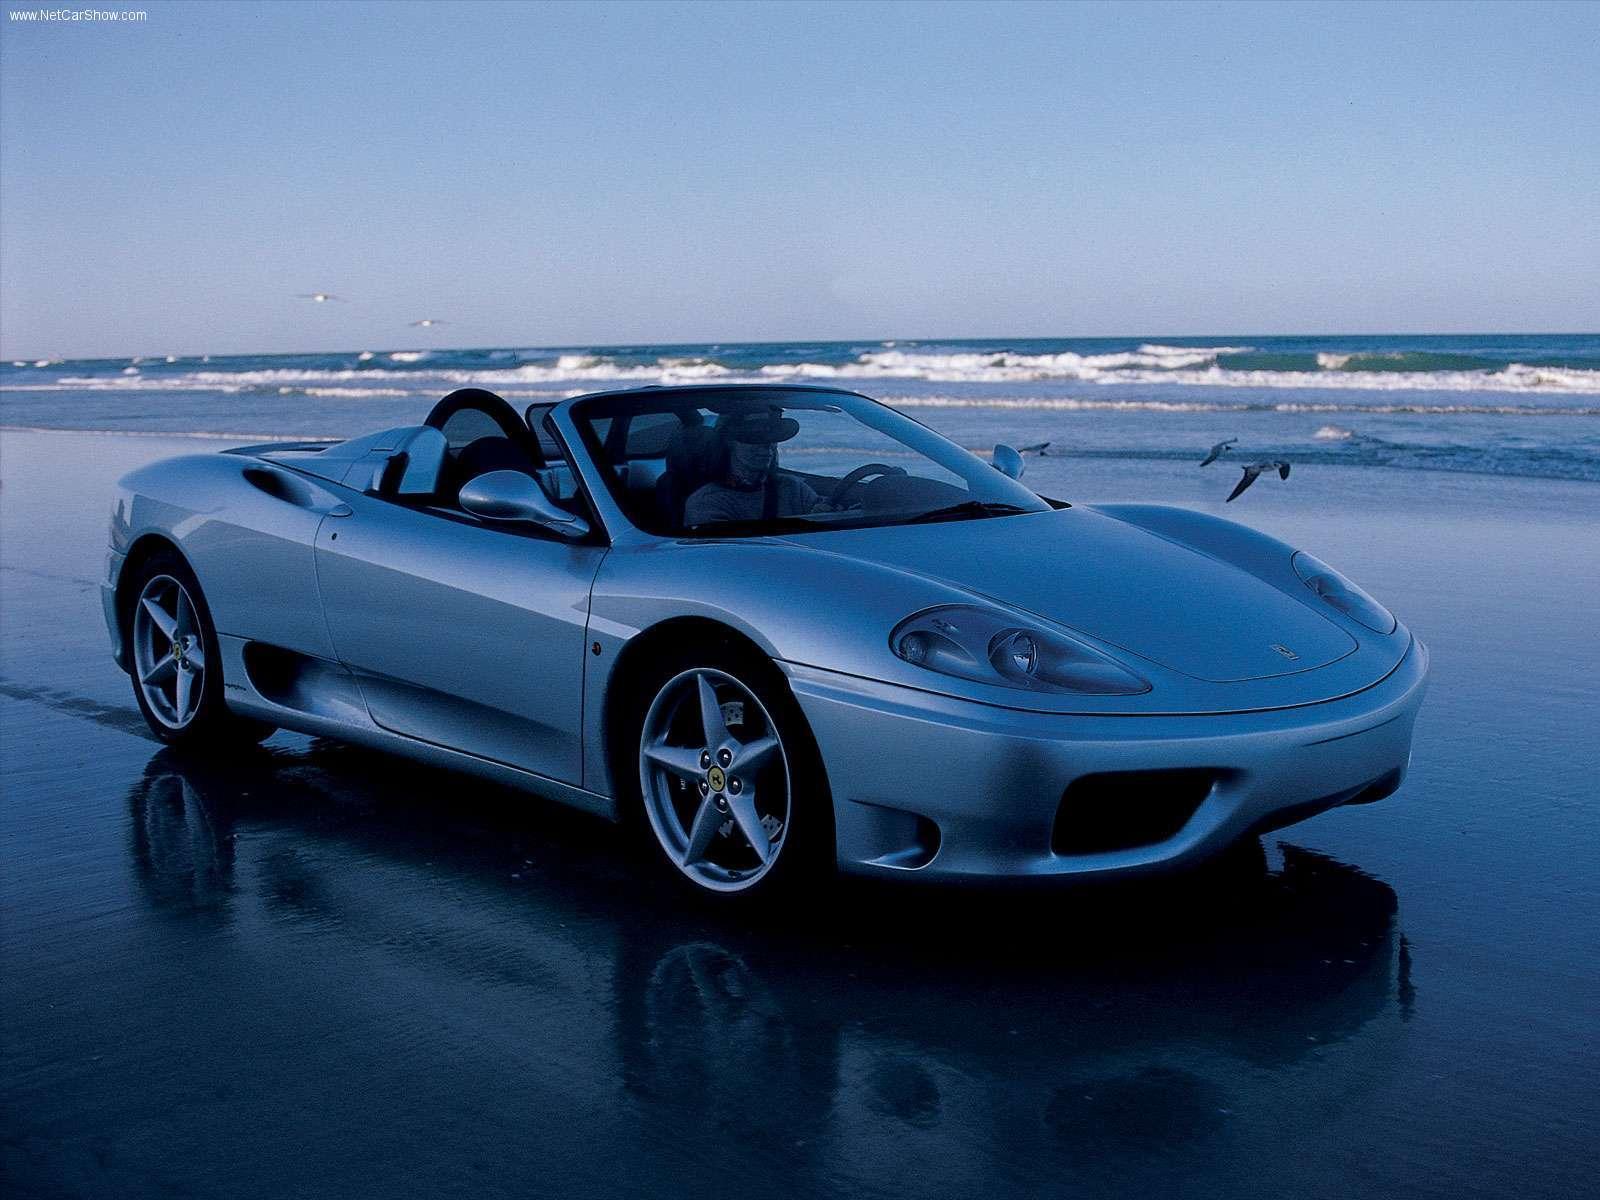 http://2.bp.blogspot.com/-yLscnetD3uA/T-jy9JlbdNI/AAAAAAAAMCE/BFc5inCqMKg/s1600/Ferrari-360_Spider_2001_1600x1200_wallpaper_03-00.jpg